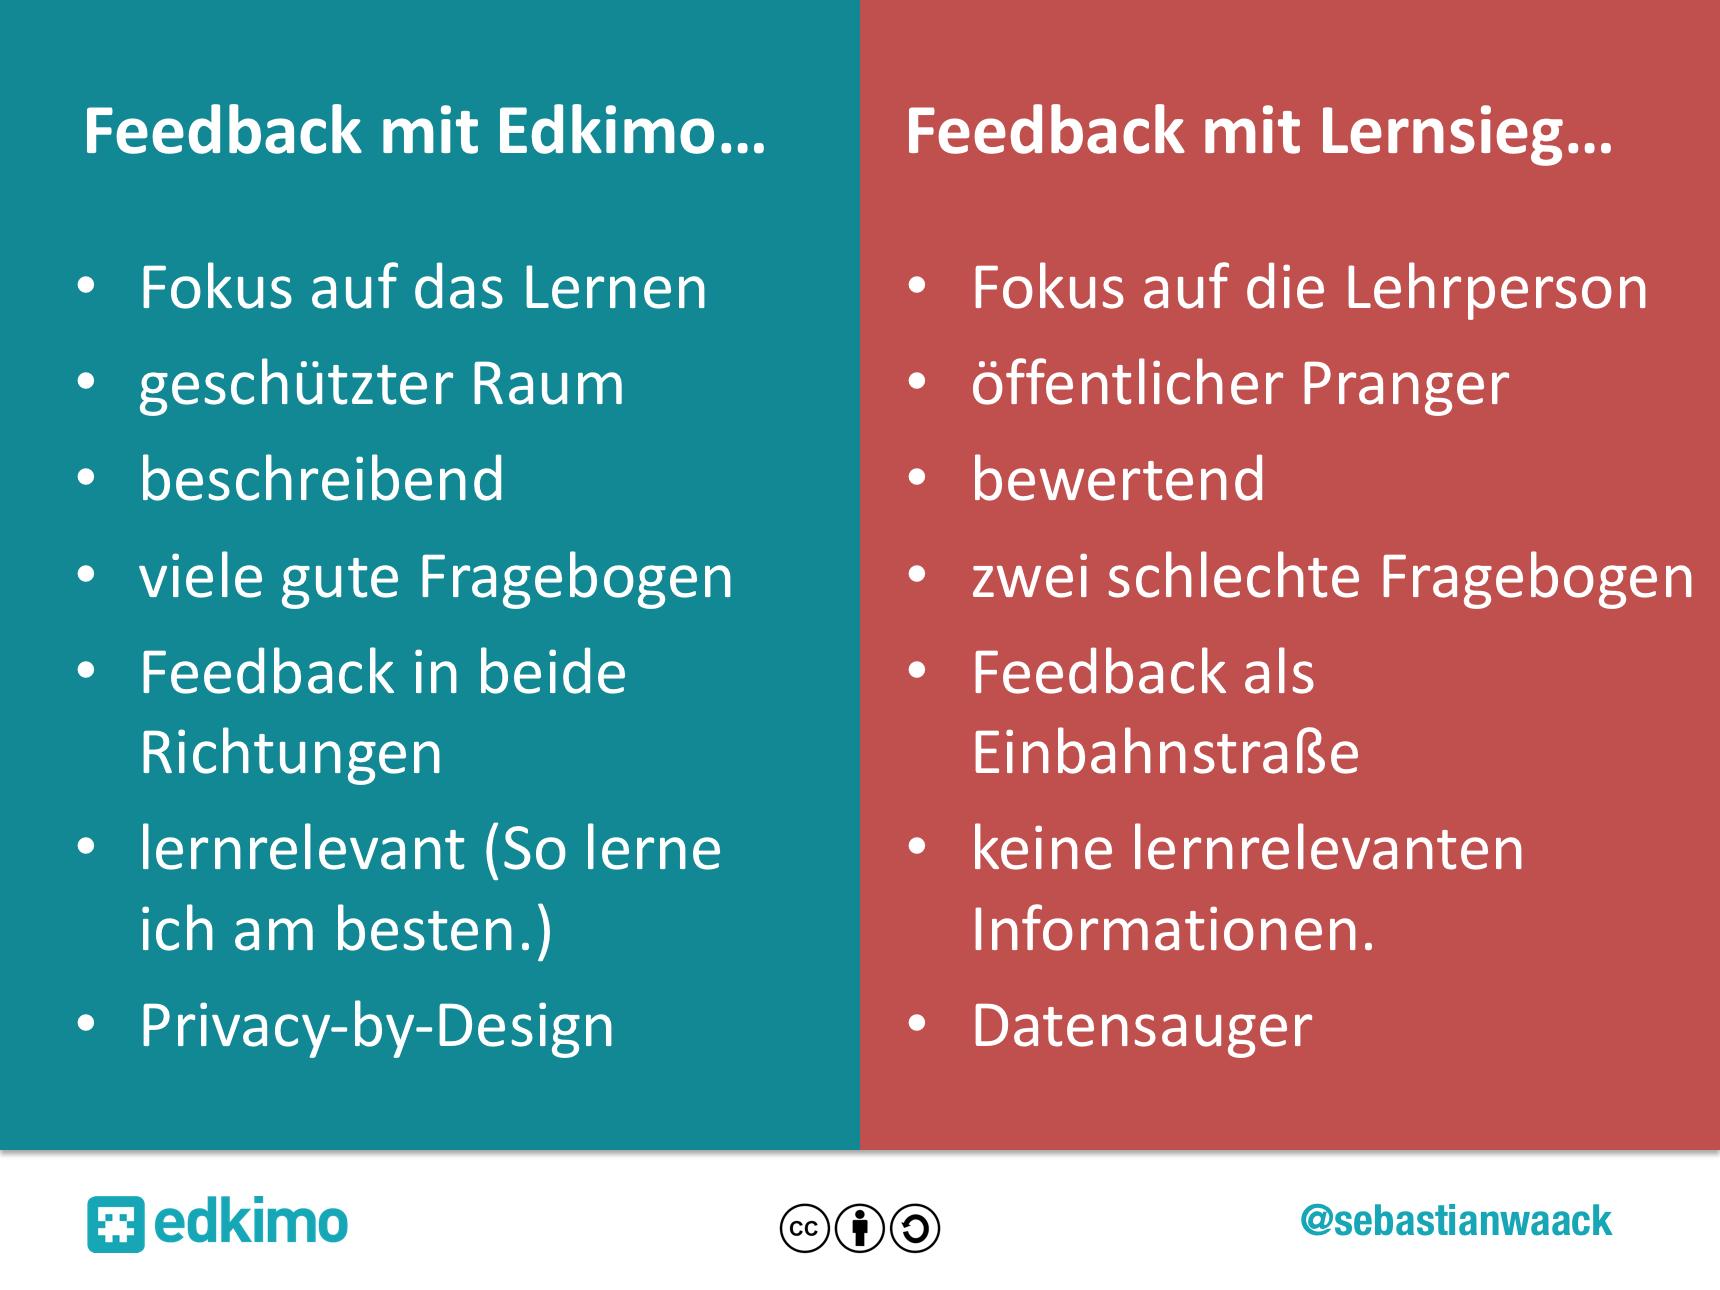 Lernsieg-vs-Edkimo-Schueler-Lehrer-Feedback-App